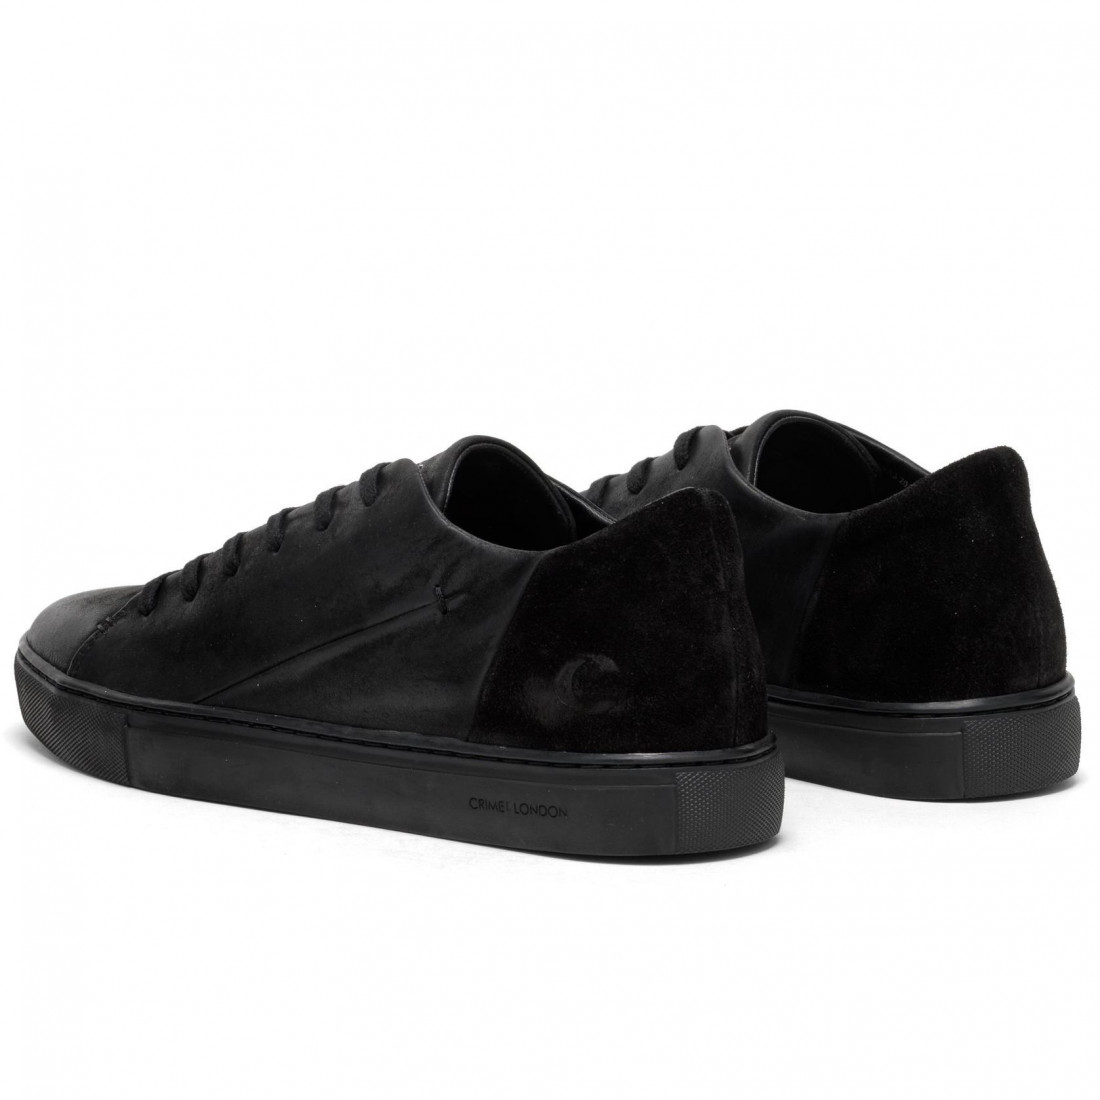 sneakers man crime london 1166020 nero 7731